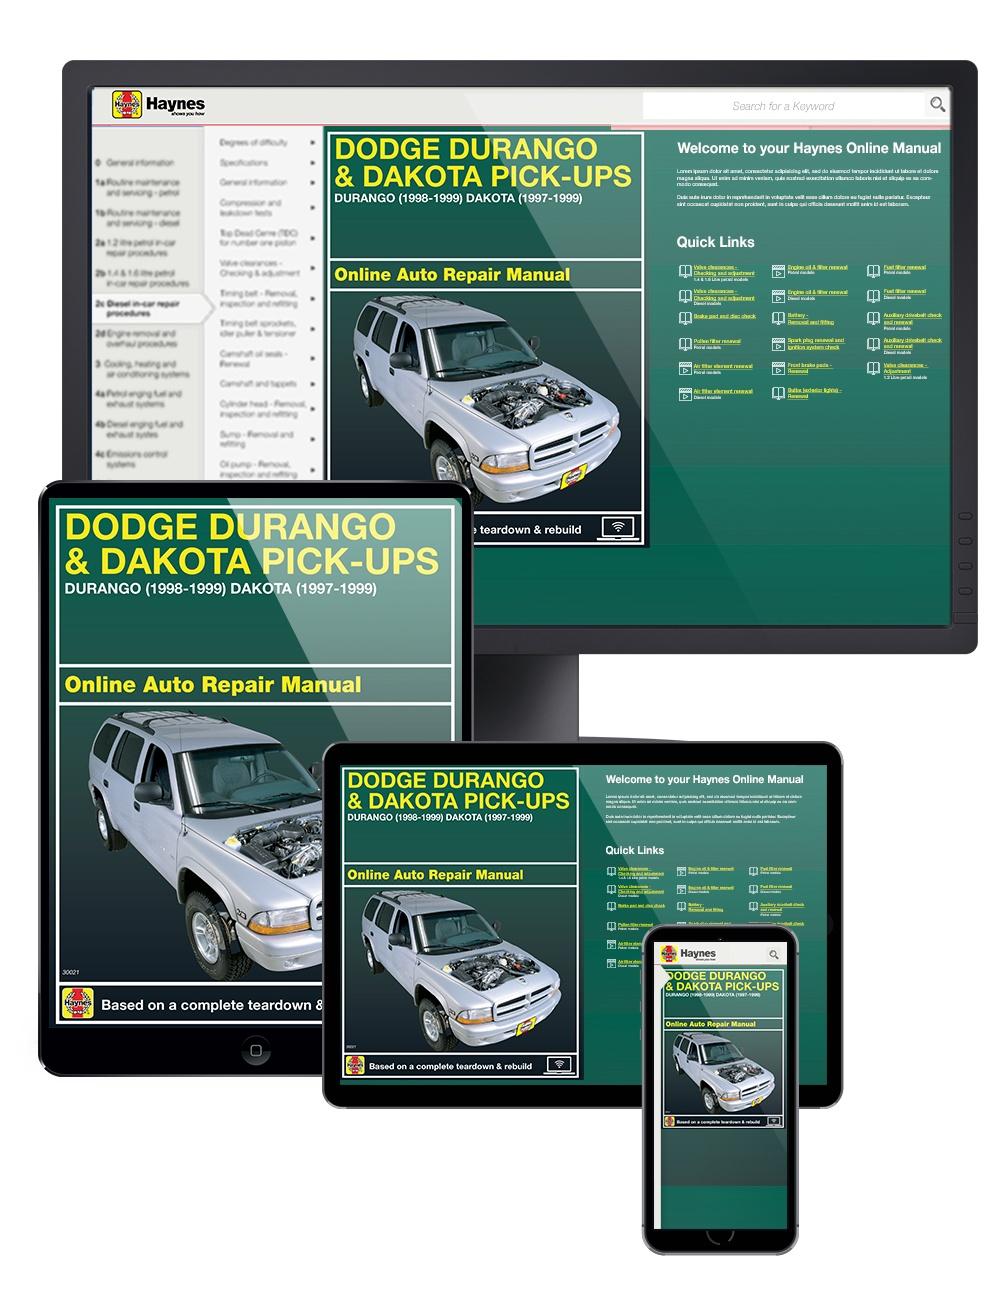 Manual cover for Dodge Durango (98-99) & Dodge Dakota (97-99) Haynes Online Manual